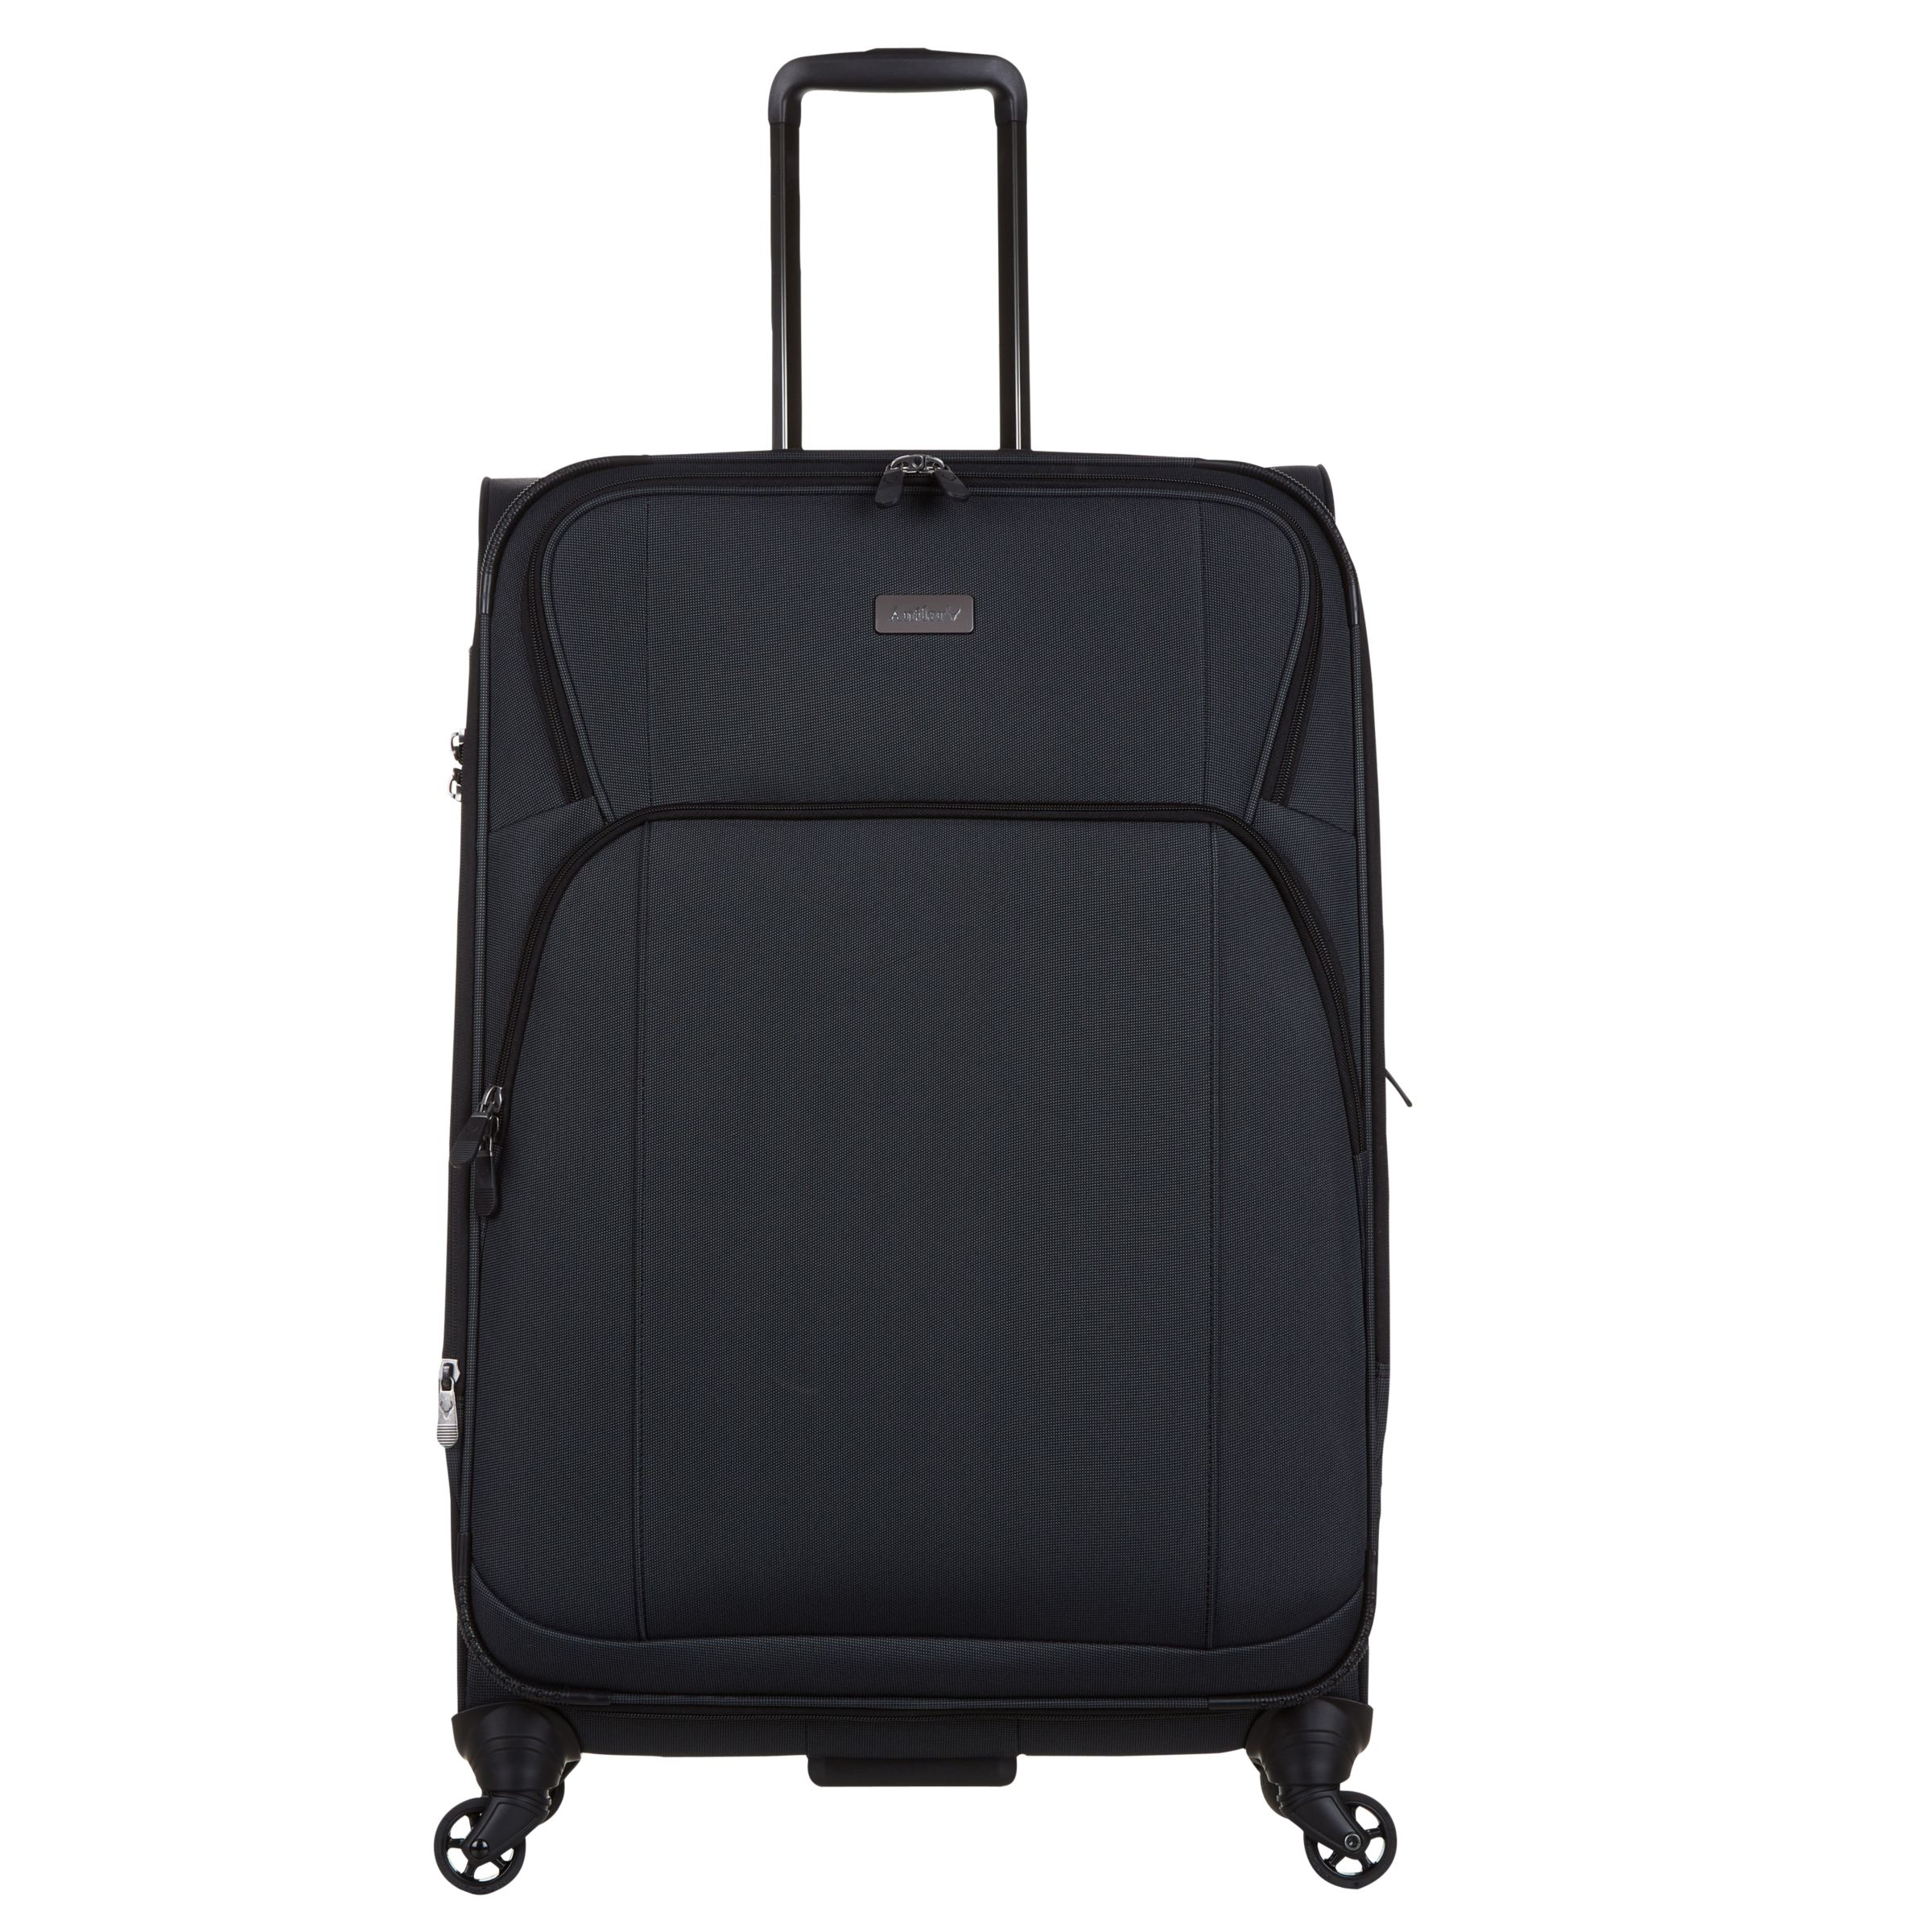 Antler Antler Airstreamii 77cm 4-Wheel Suitcase, Charcoal